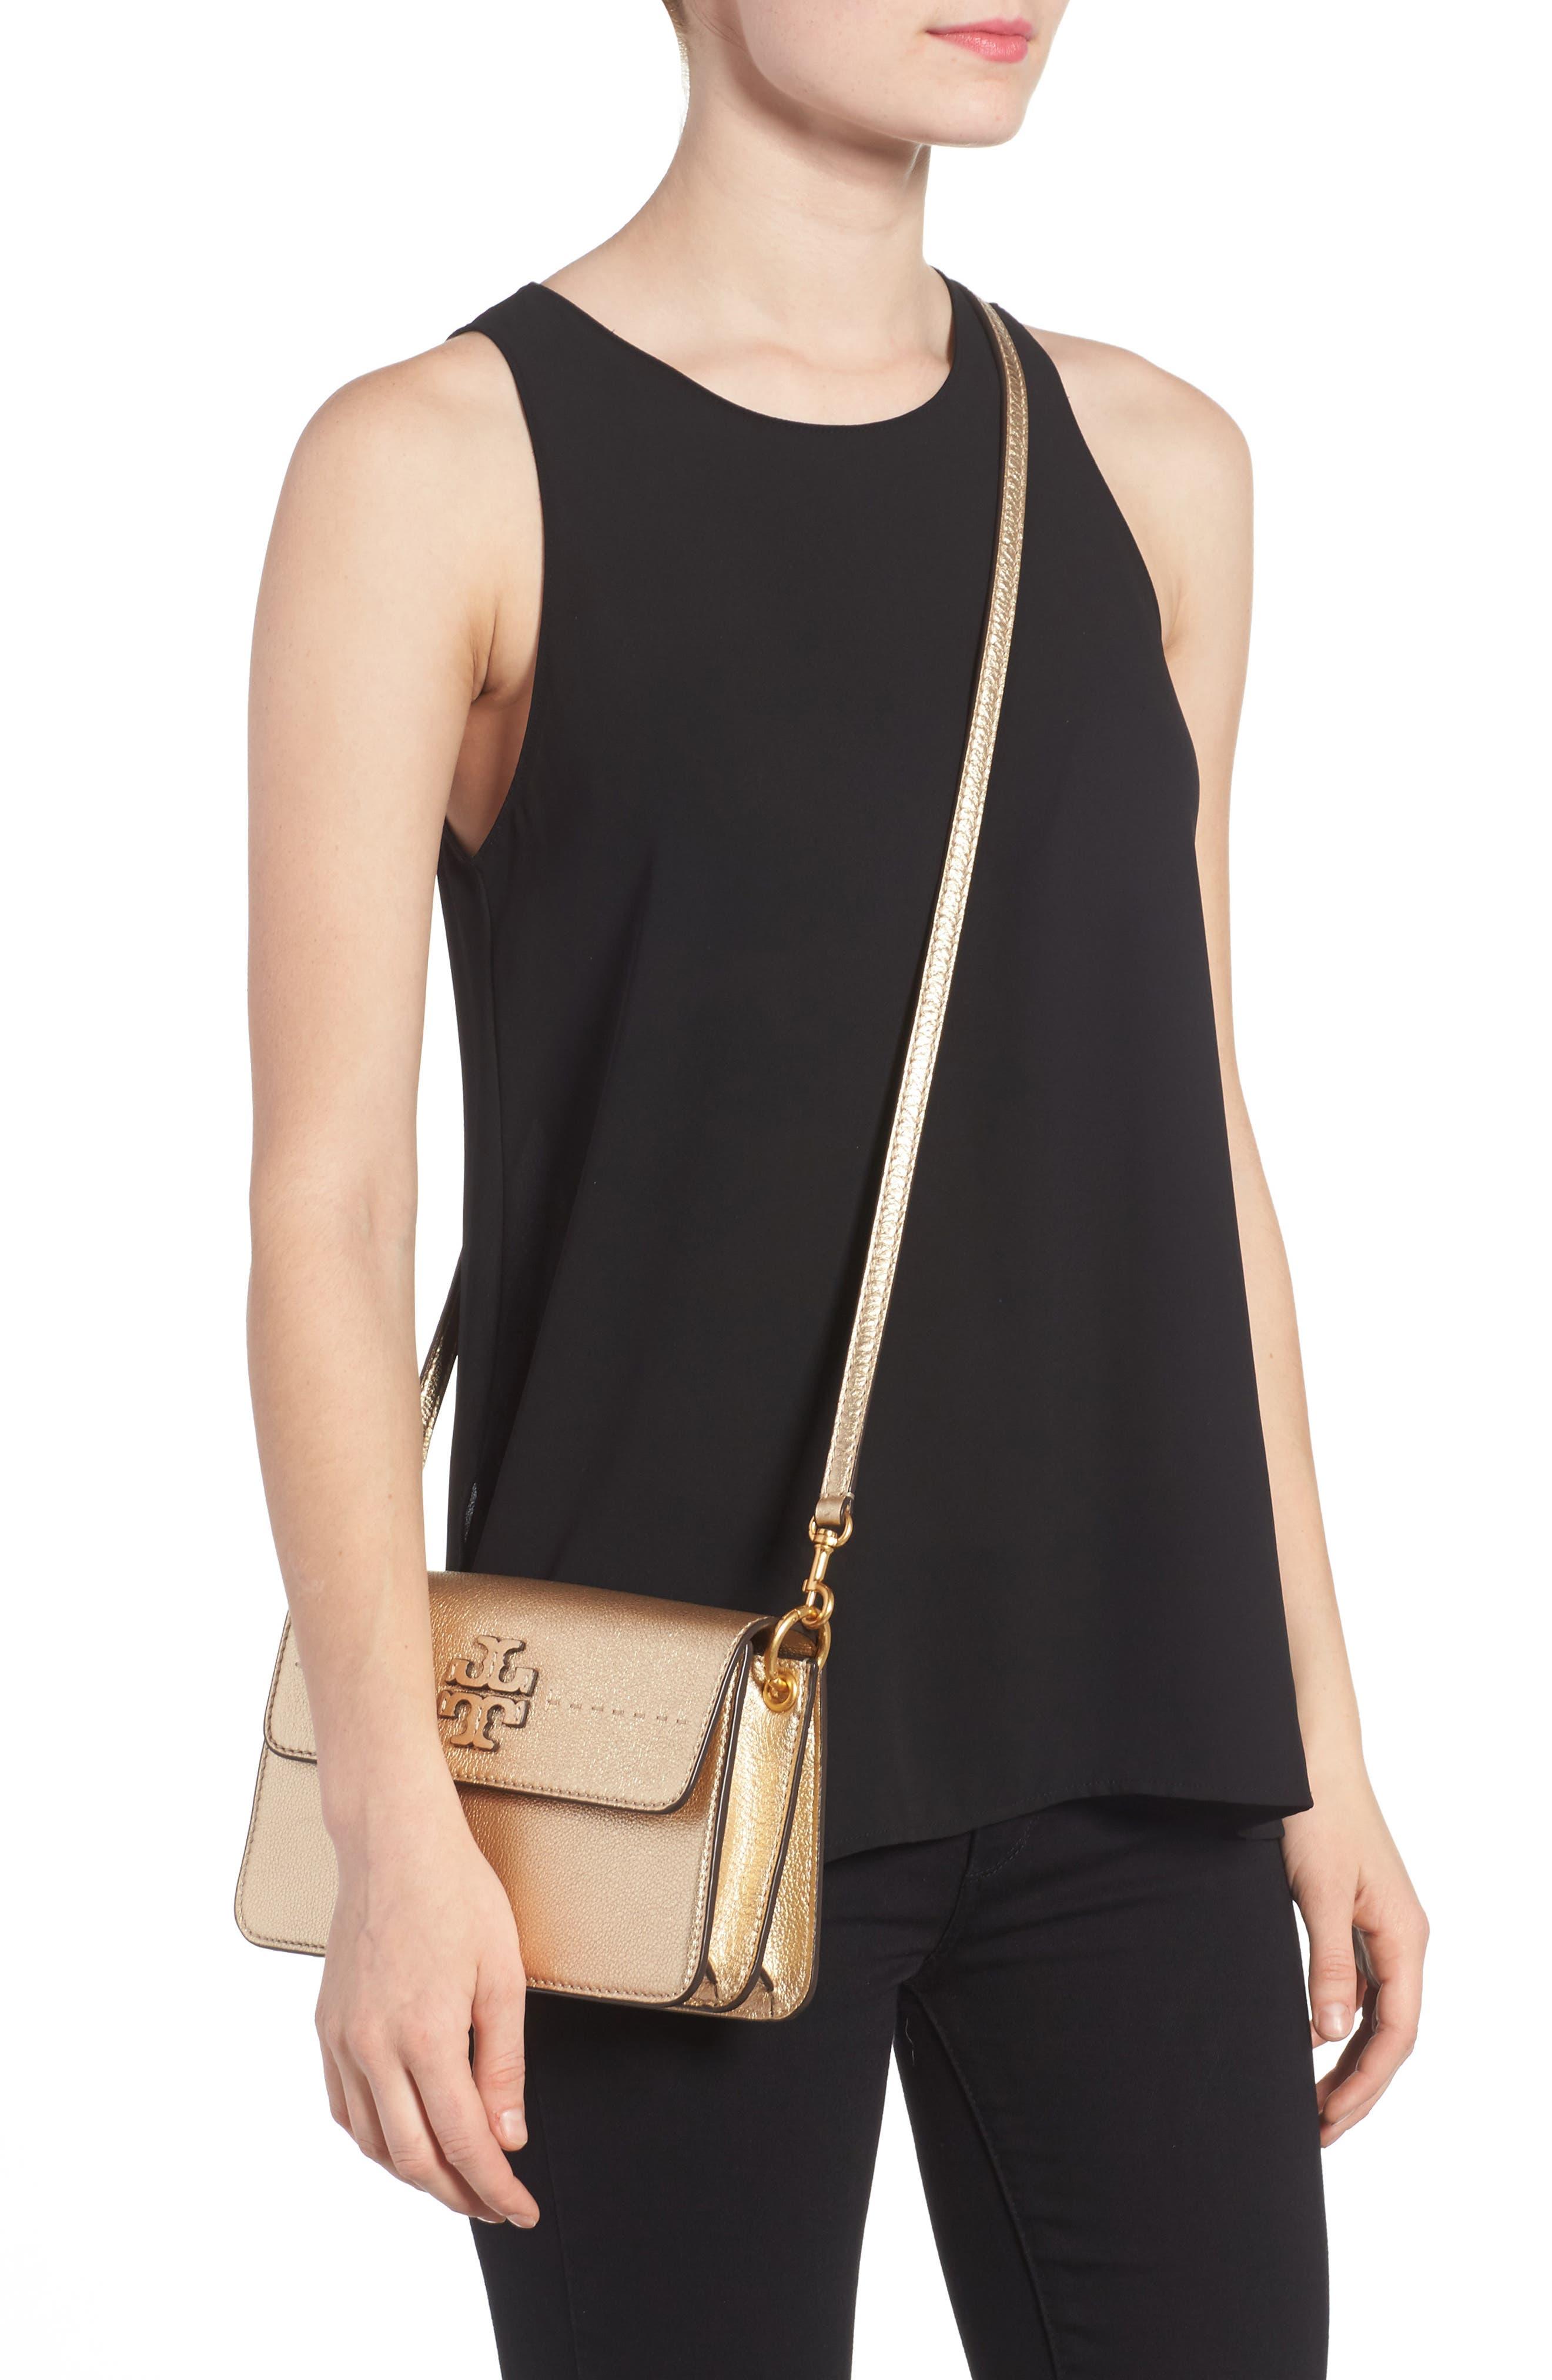 McGraw Metallic Leather Shoulder Bag,                             Alternate thumbnail 2, color,